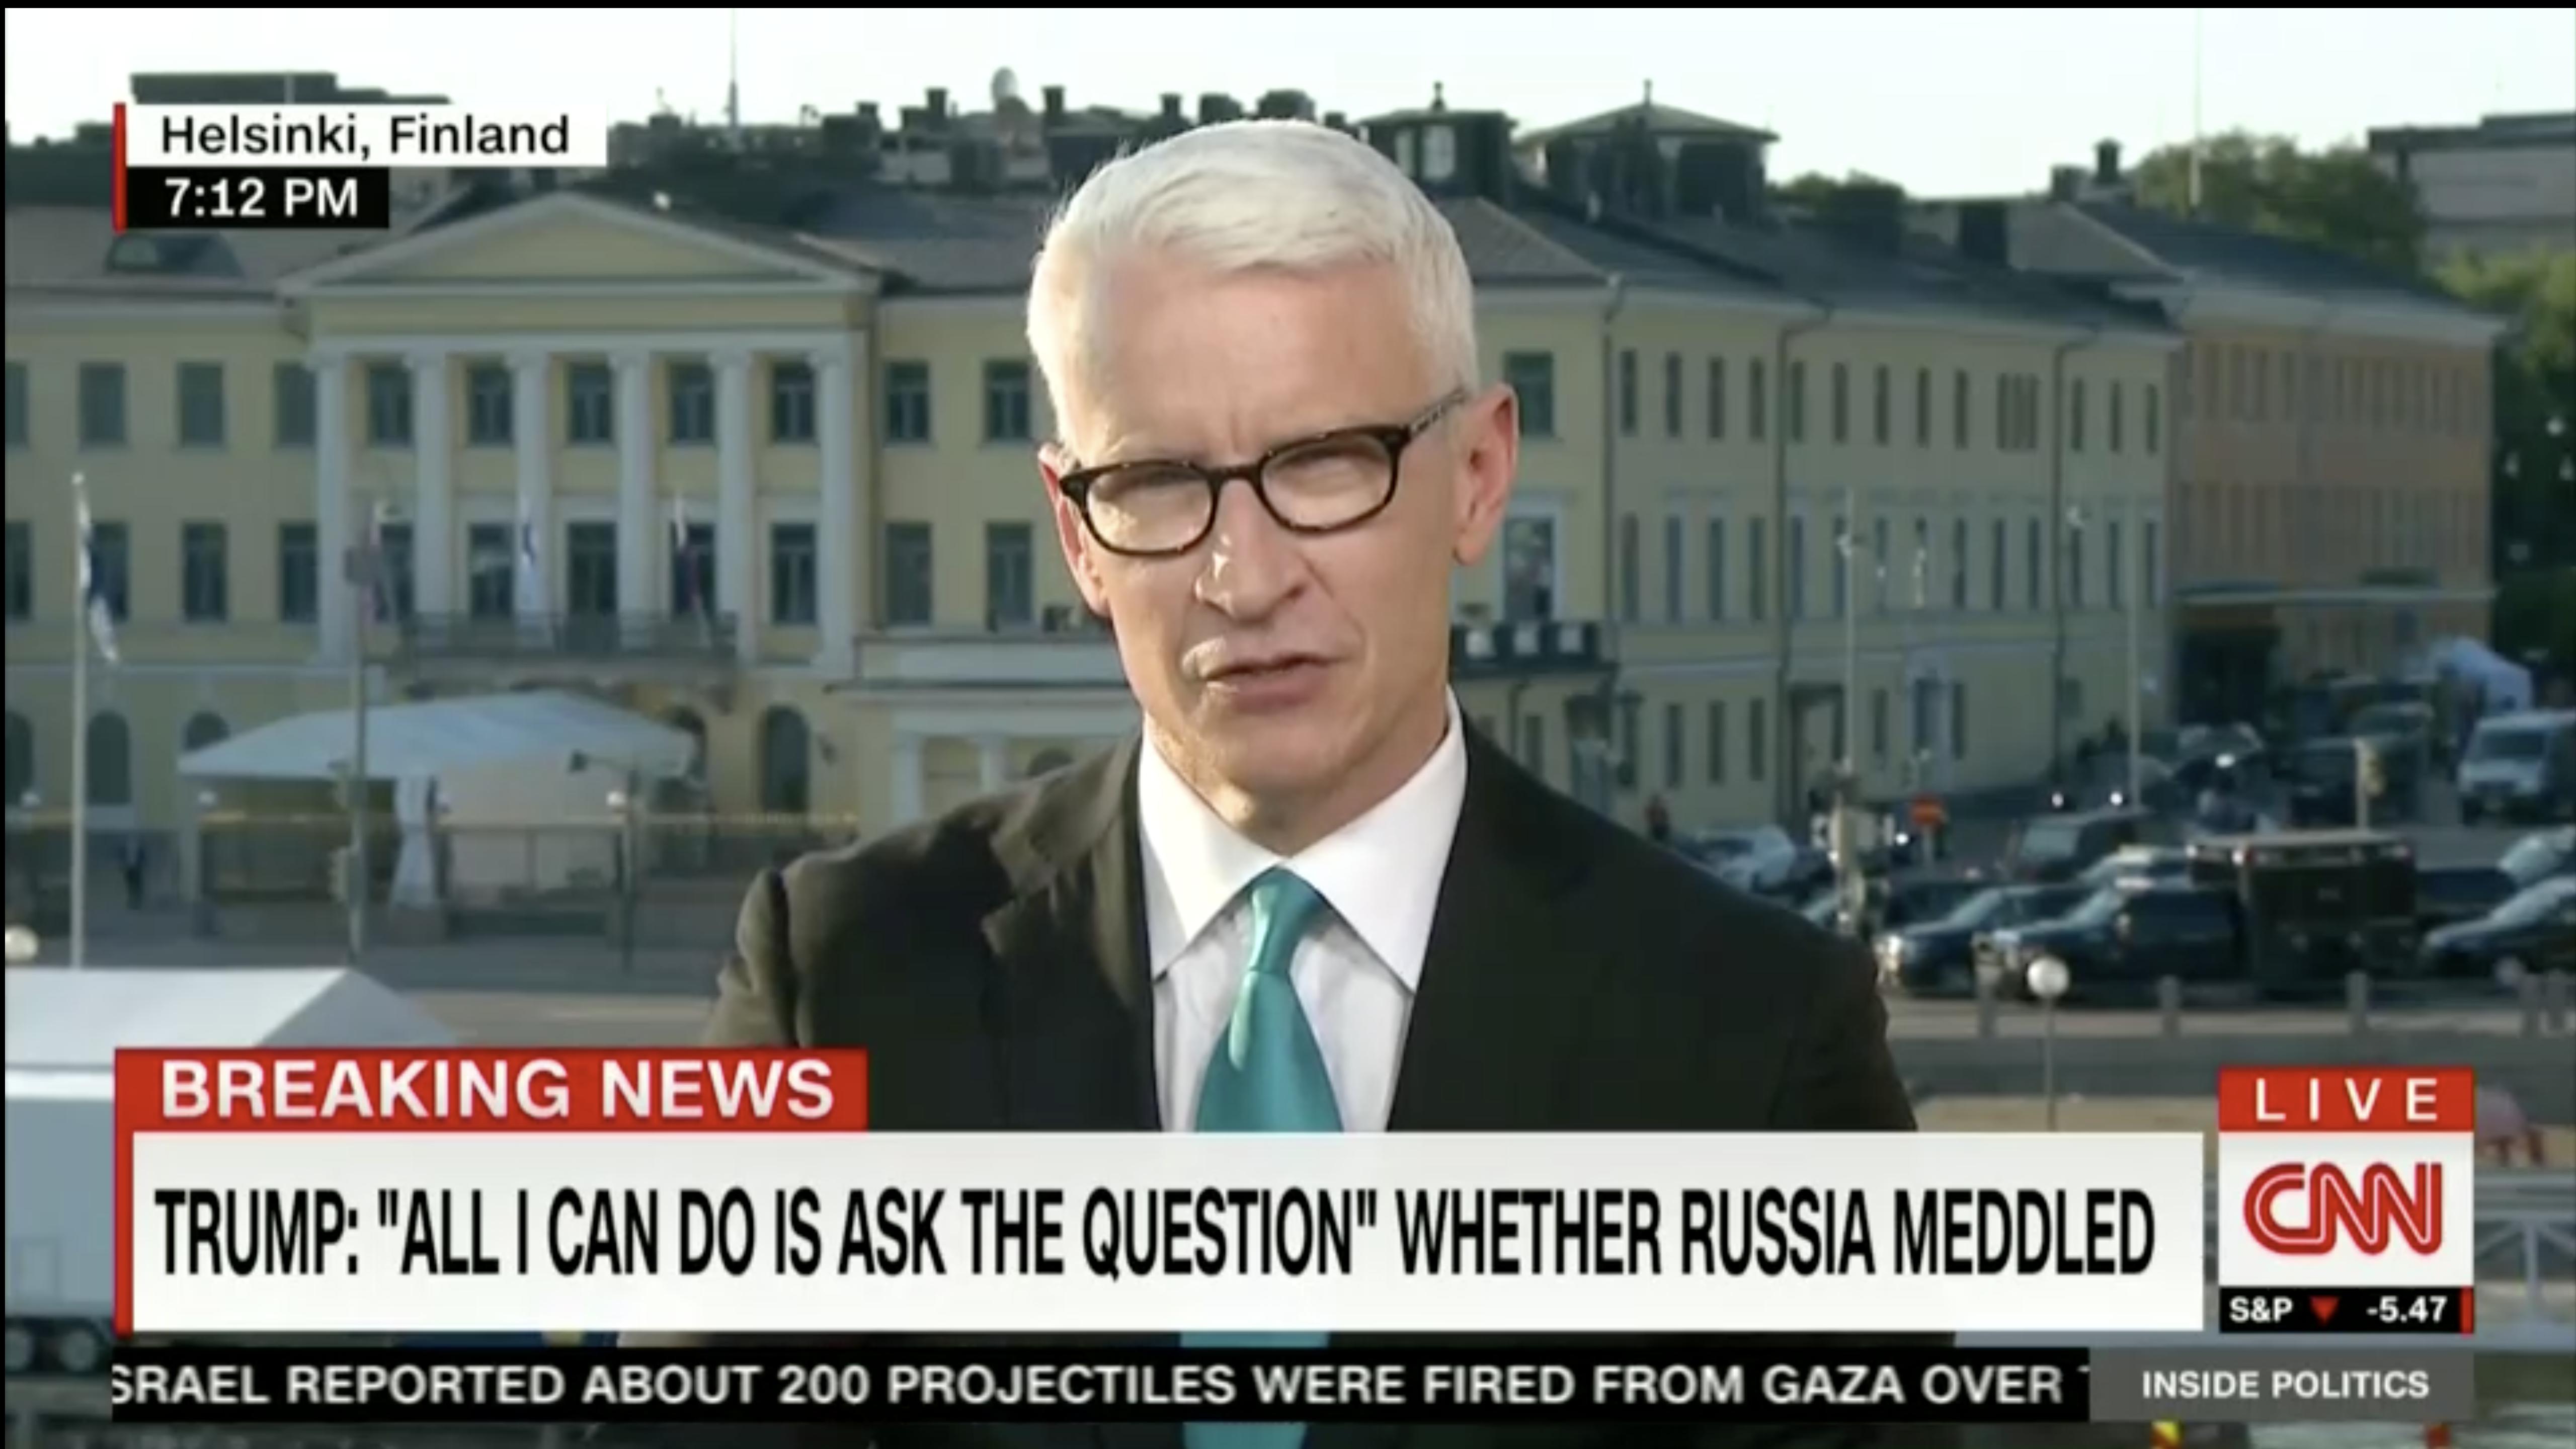 Anderson Cooper Calls Trumps Helsinki Performance Disgraceful